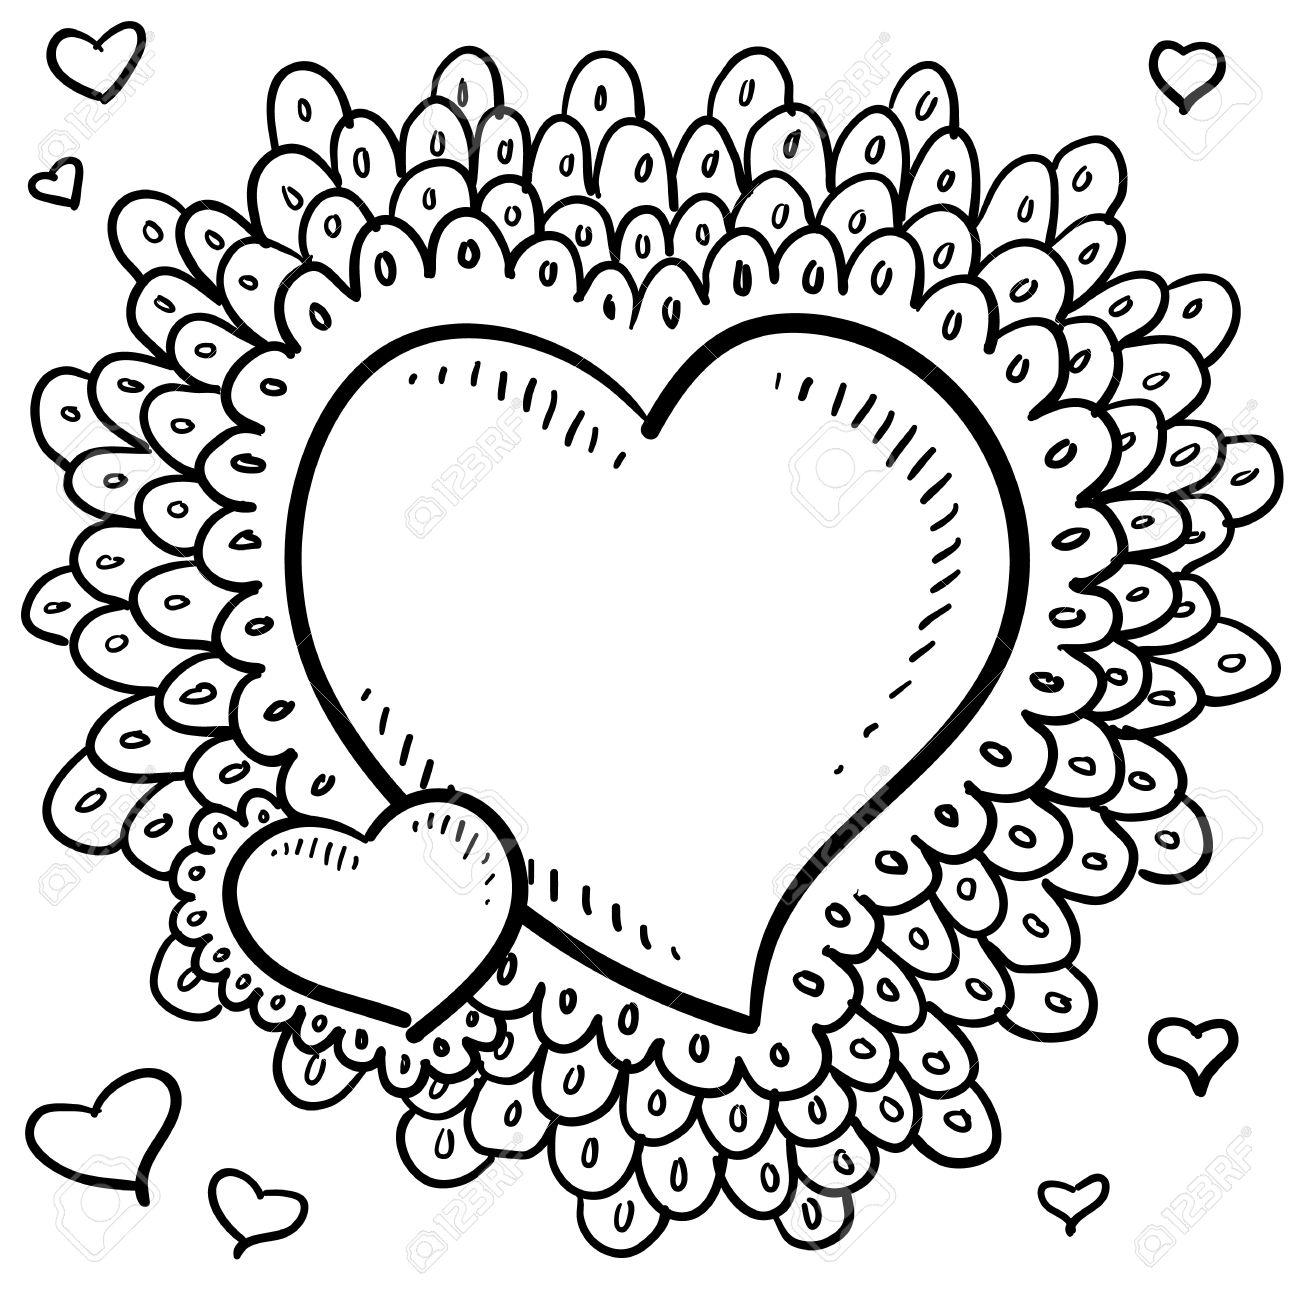 Drawn hearts doodle art #15